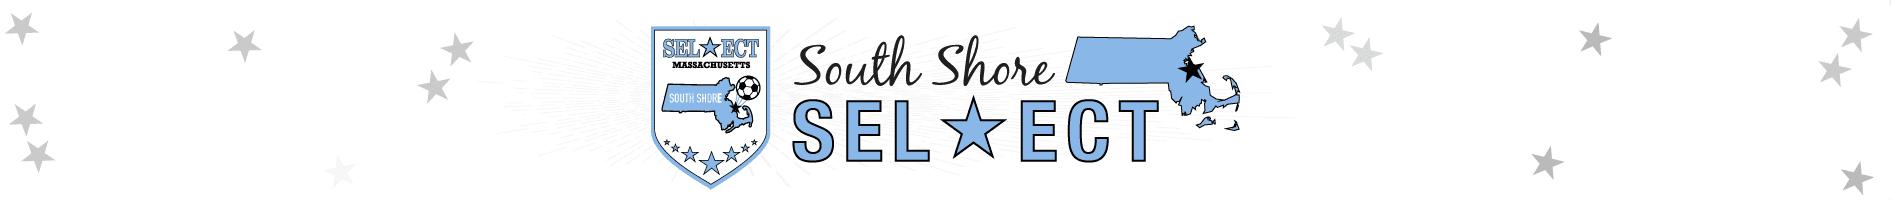 South Shore Select Soccer